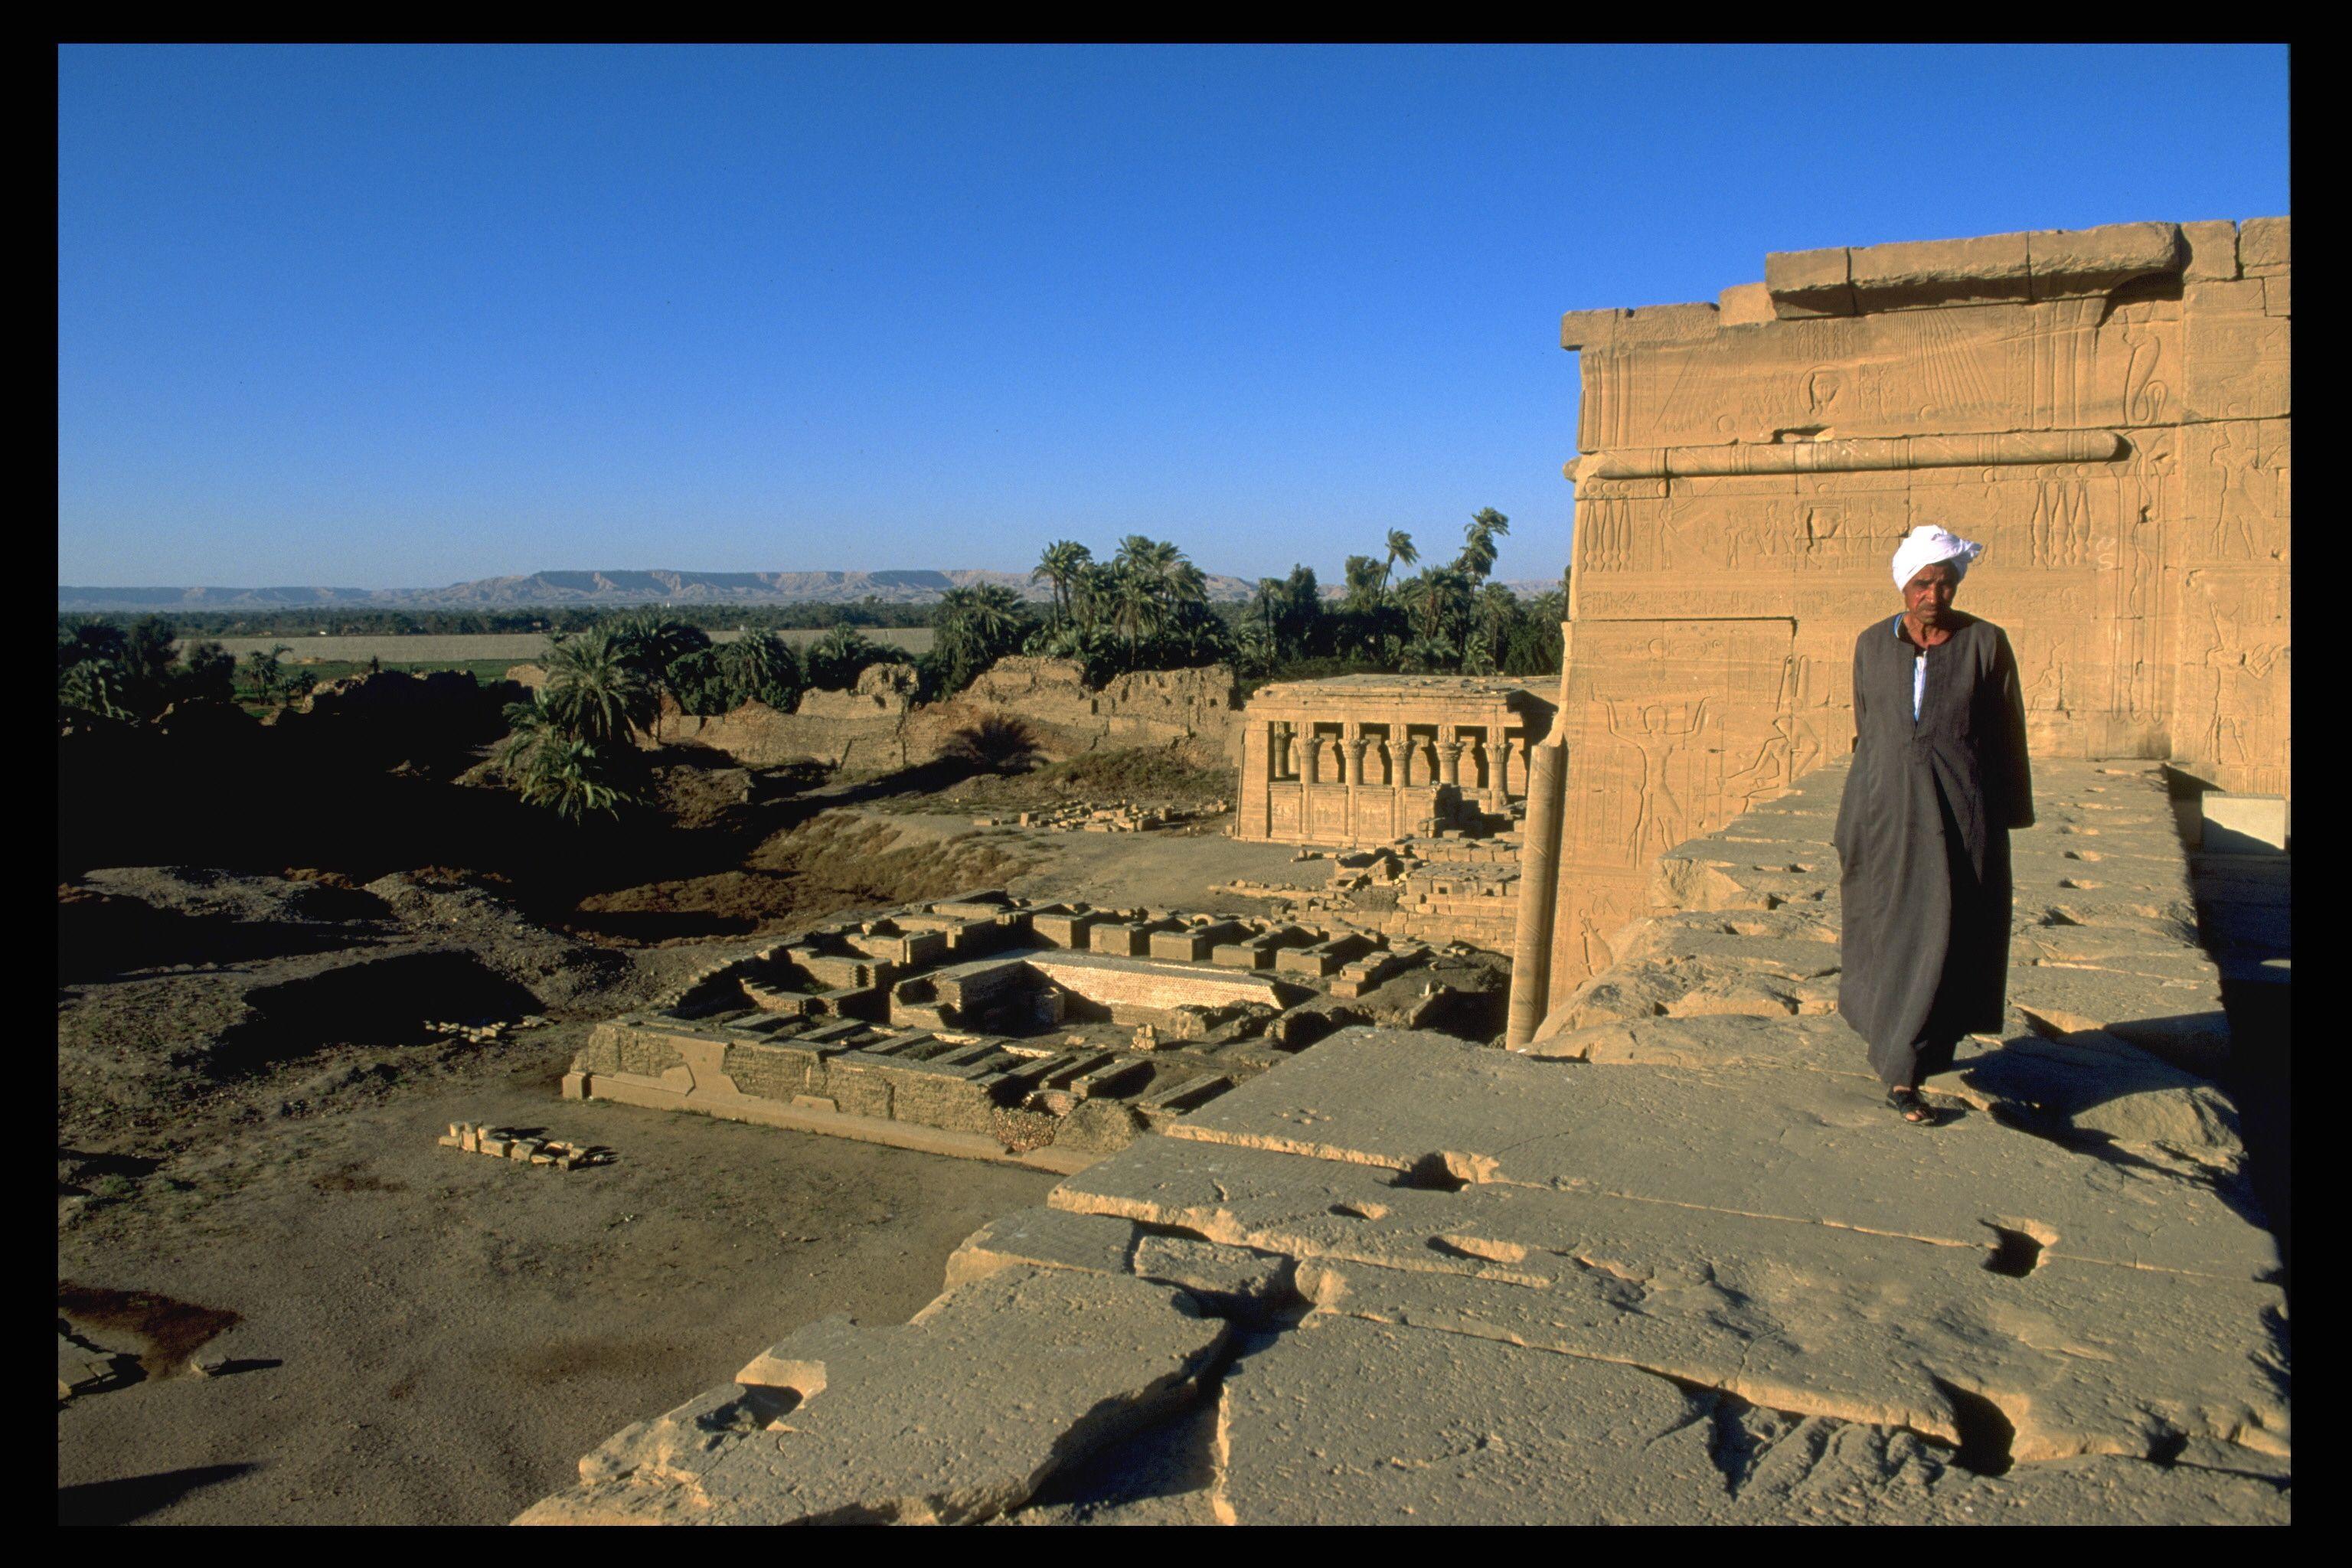 Temple of Dendera, Egypt